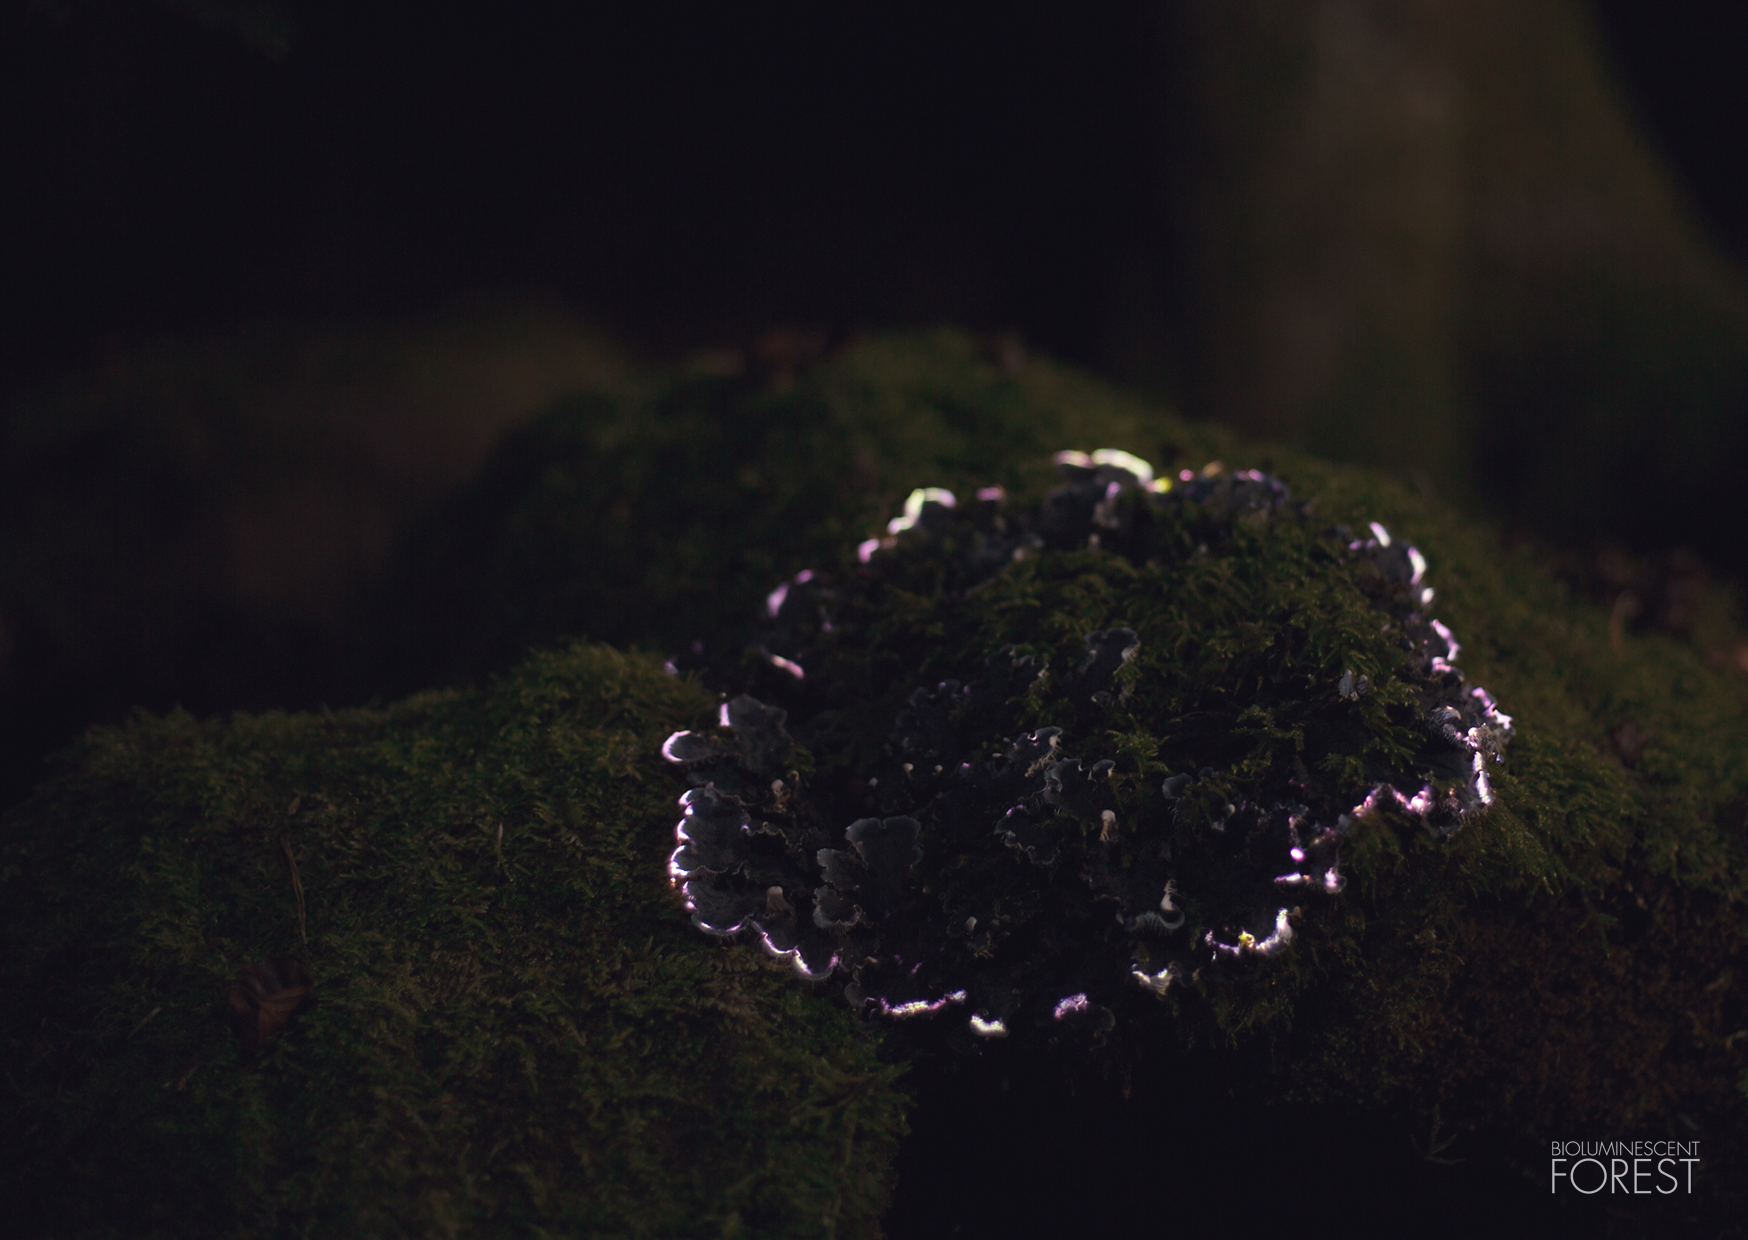 Bioluminescent forest – mushroom_round_02